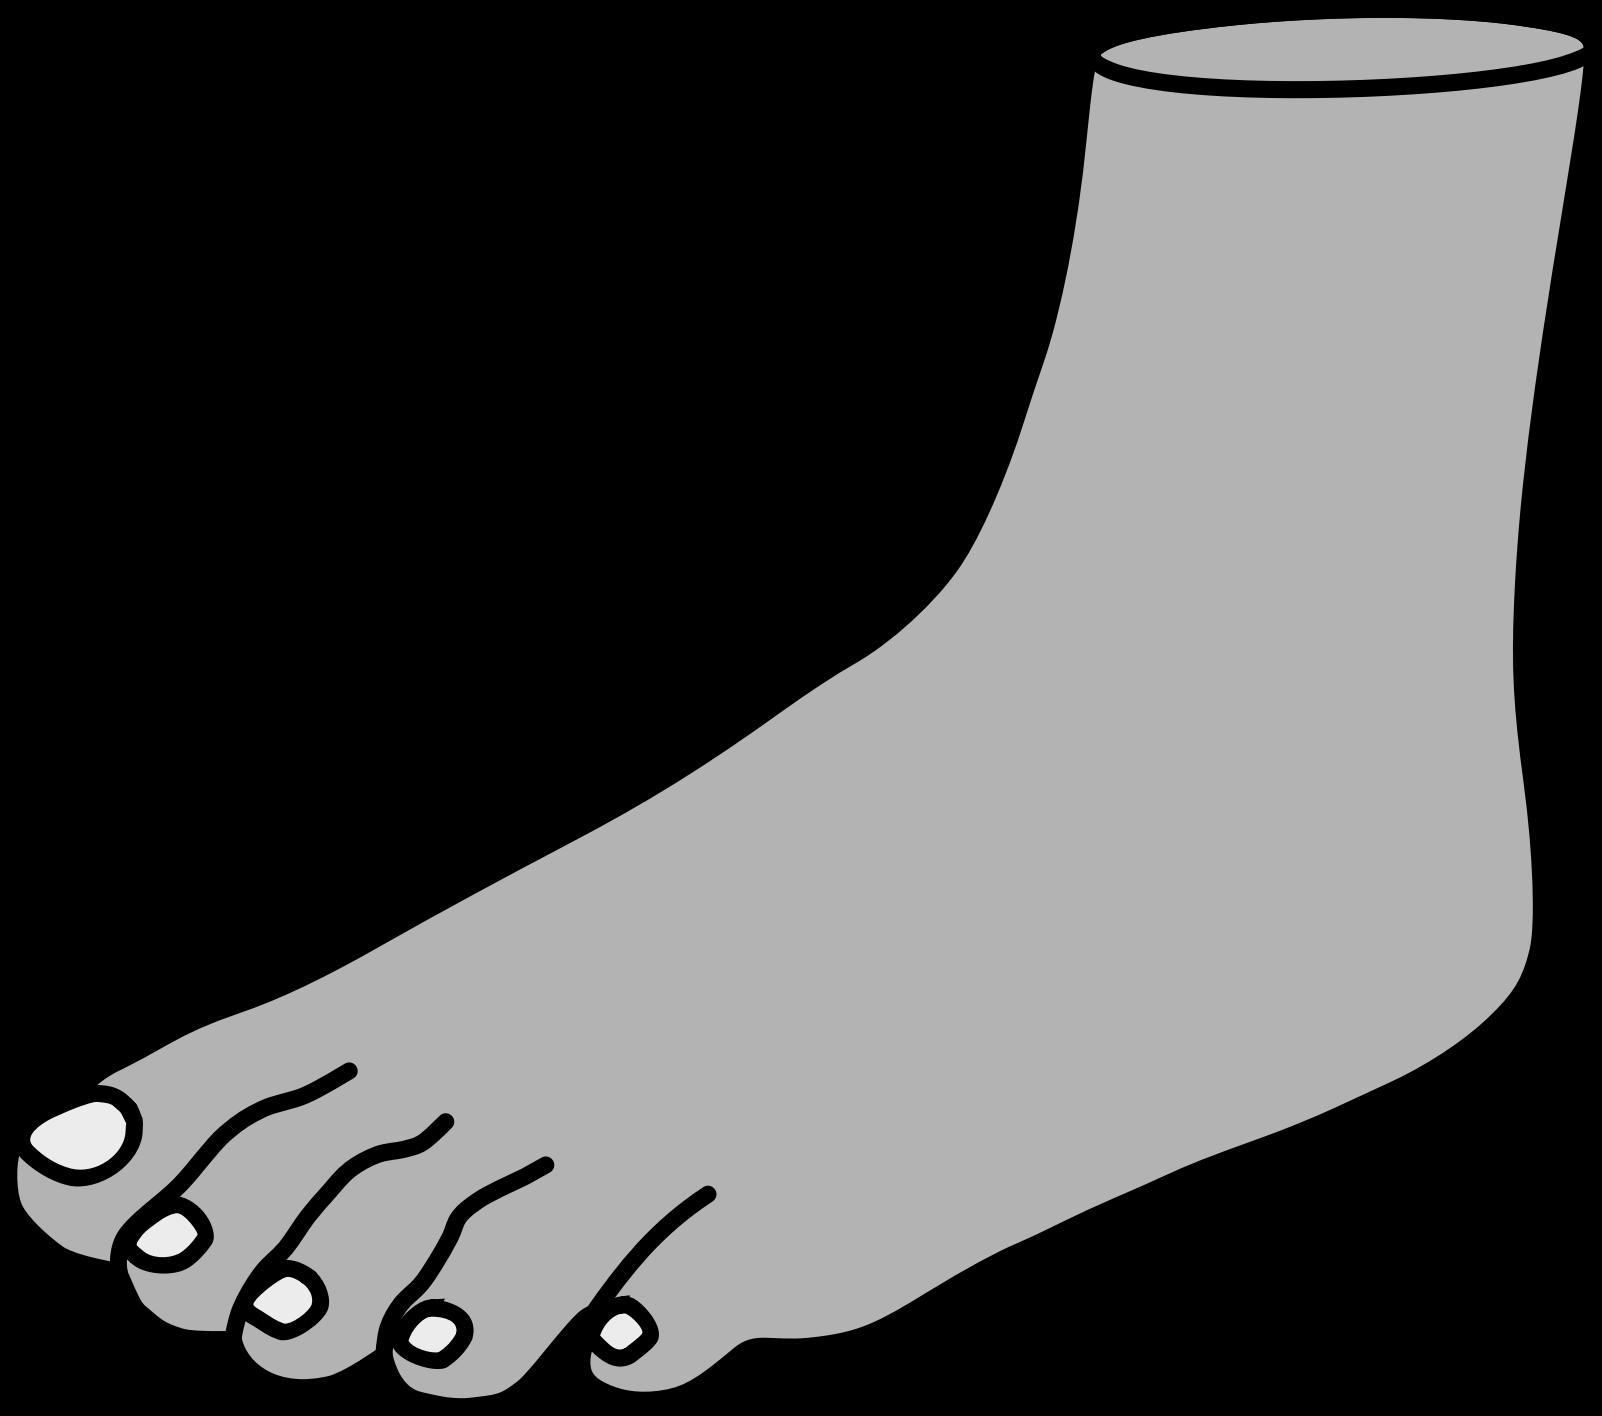 1602x1416 Foot Clipart 3